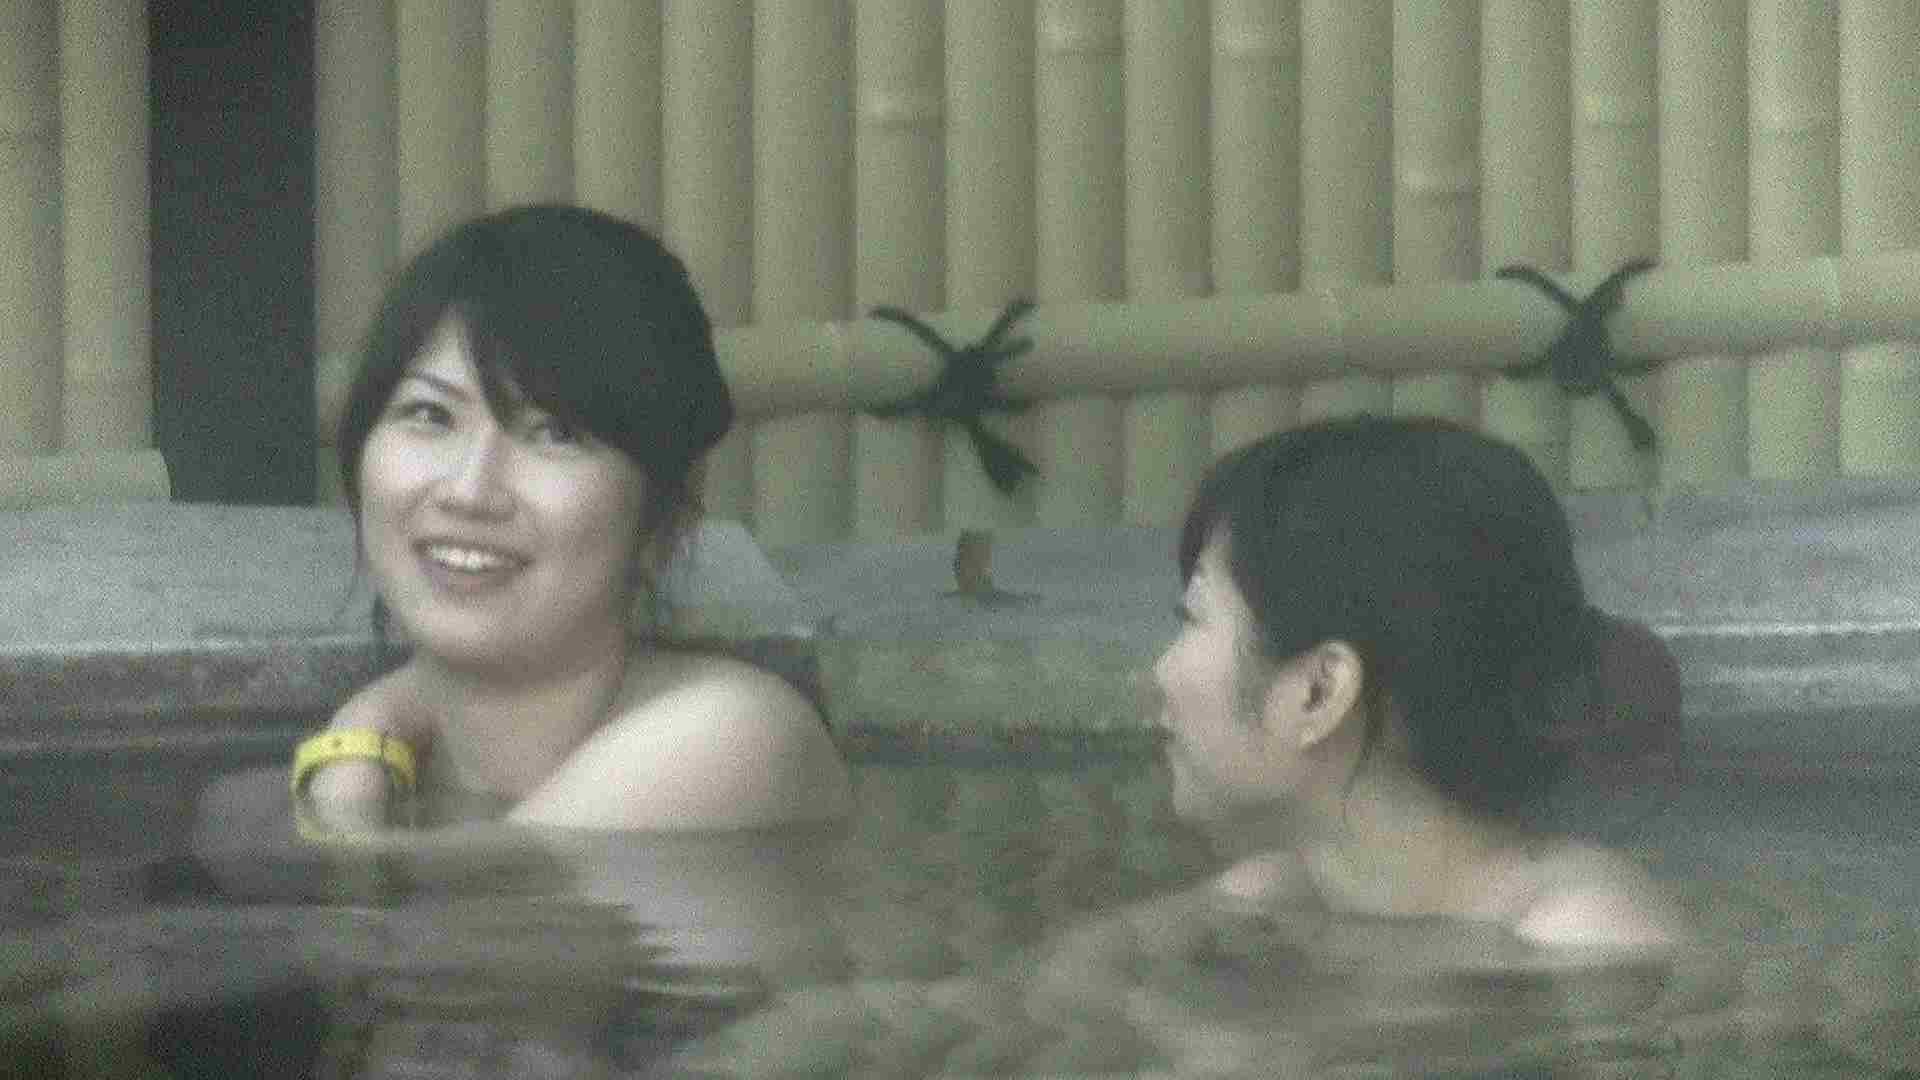 Aquaな露天風呂Vol.206 0  59連発 4